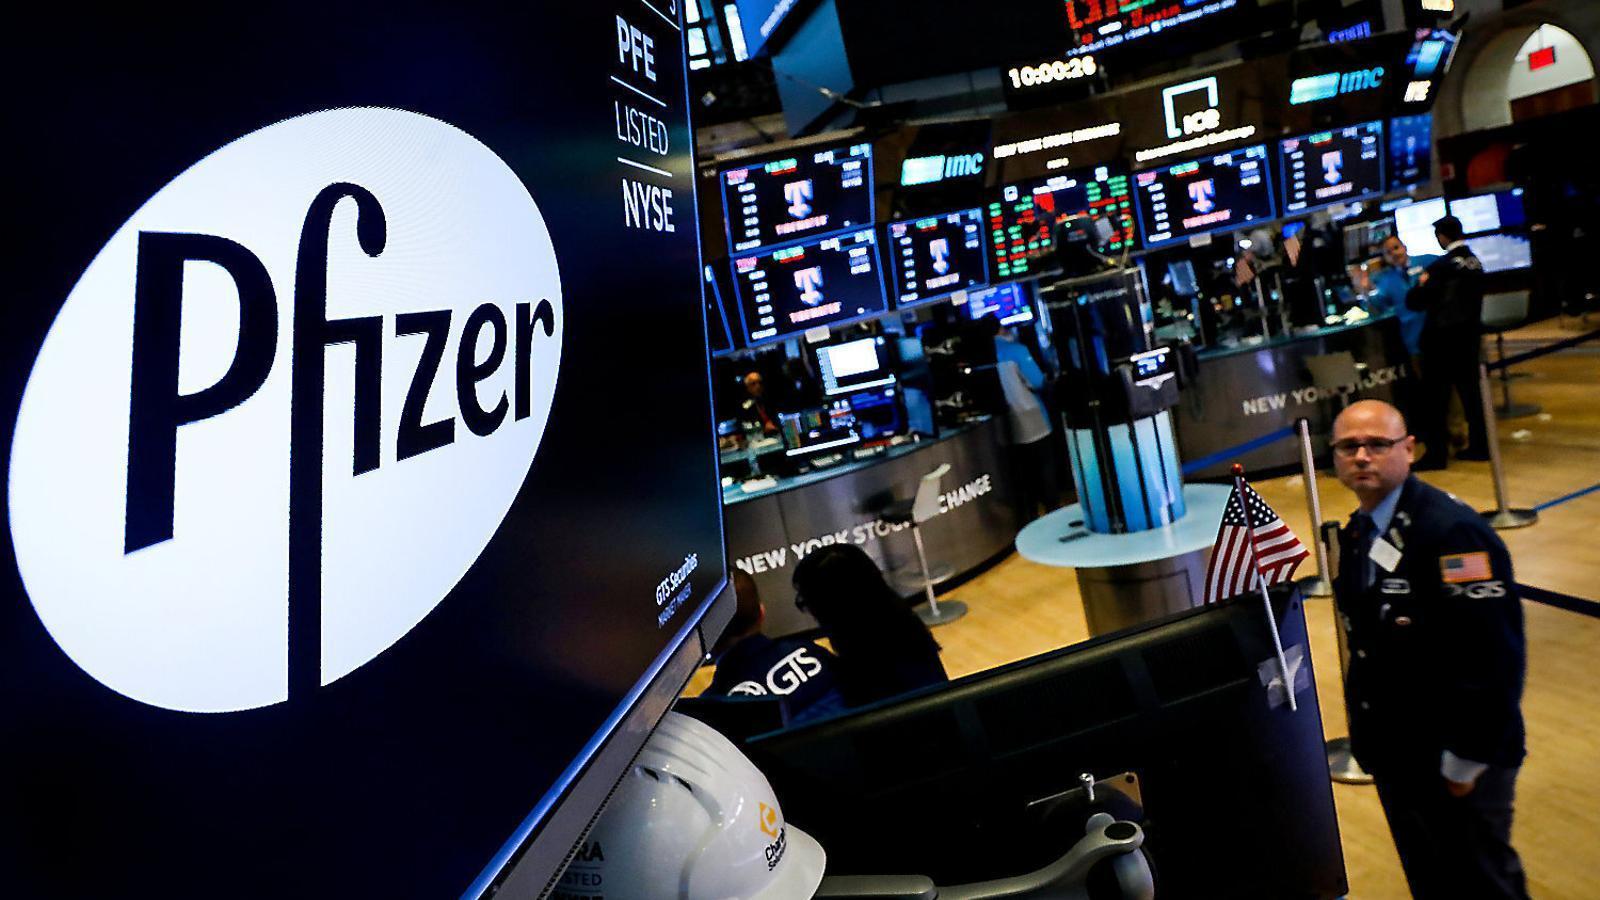 Pfizer: fons, Viagra i remei al pessimisme global